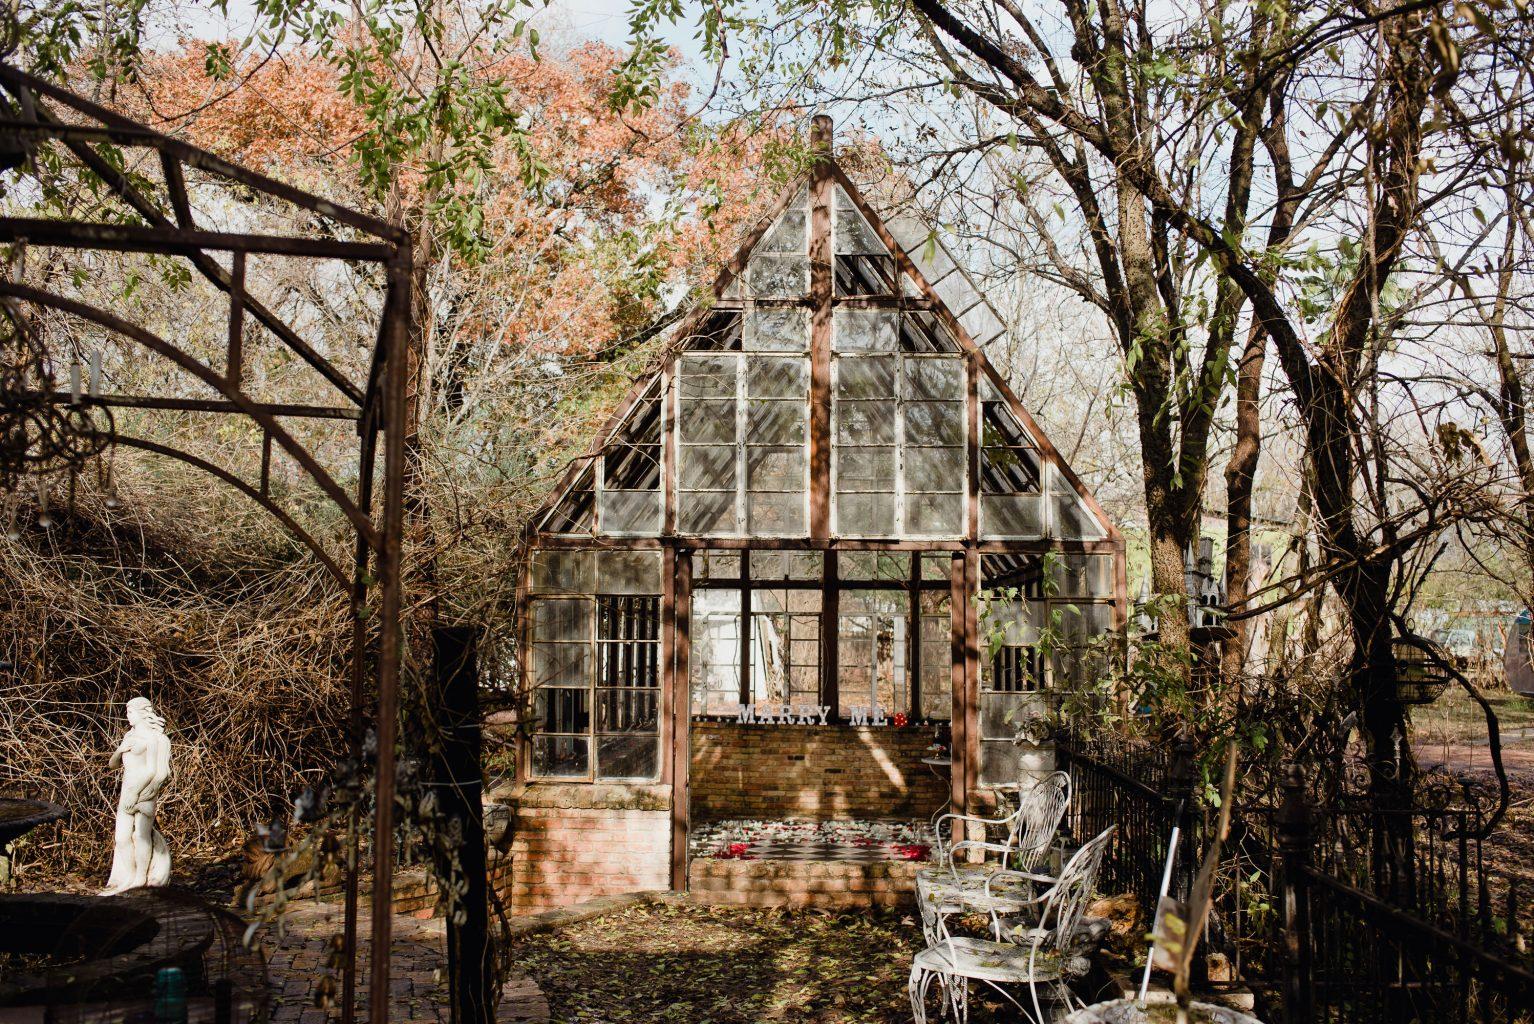 sekrit theater, austin proposal photographer, winter proposal in austin, austin proposal locations